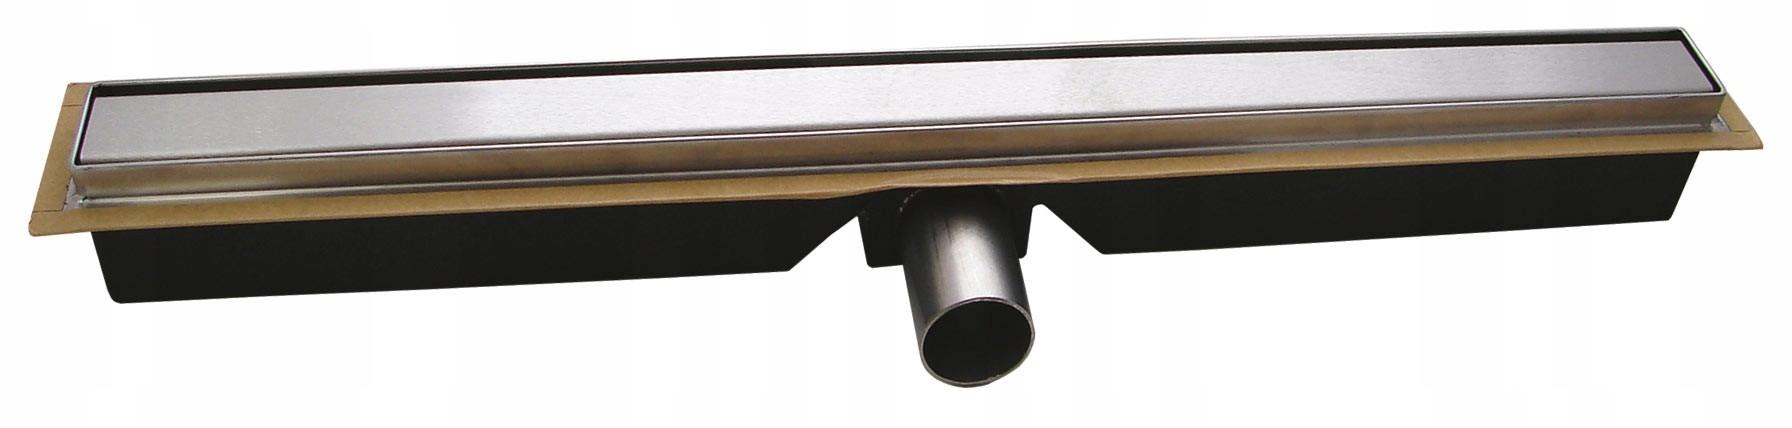 Lineárny odtok SLIM PRO, 60 cm OLSP1-60 Ferro